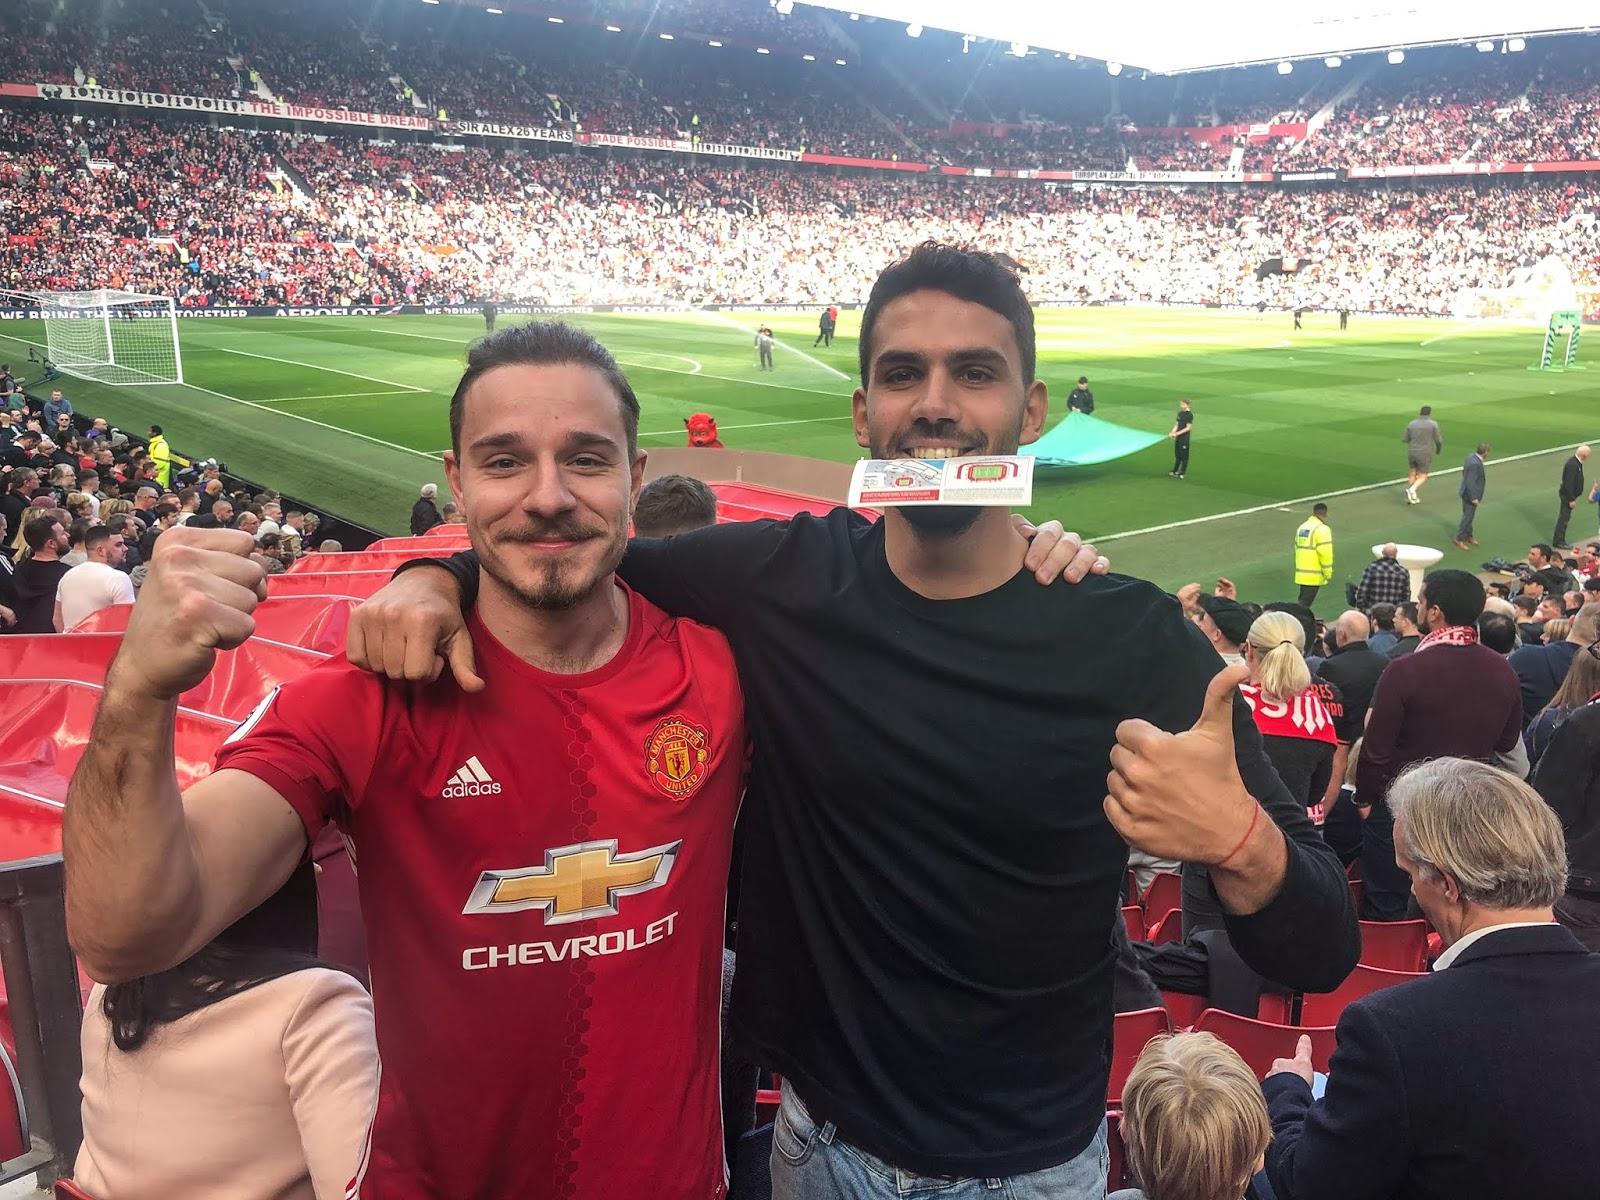 «Football Stories»: Ο Γιώργος Λέντζας και ο Άγγελος Γιακουμίδης ταξιδεύουν στην Αργεντινή - Φωτογραφία 1